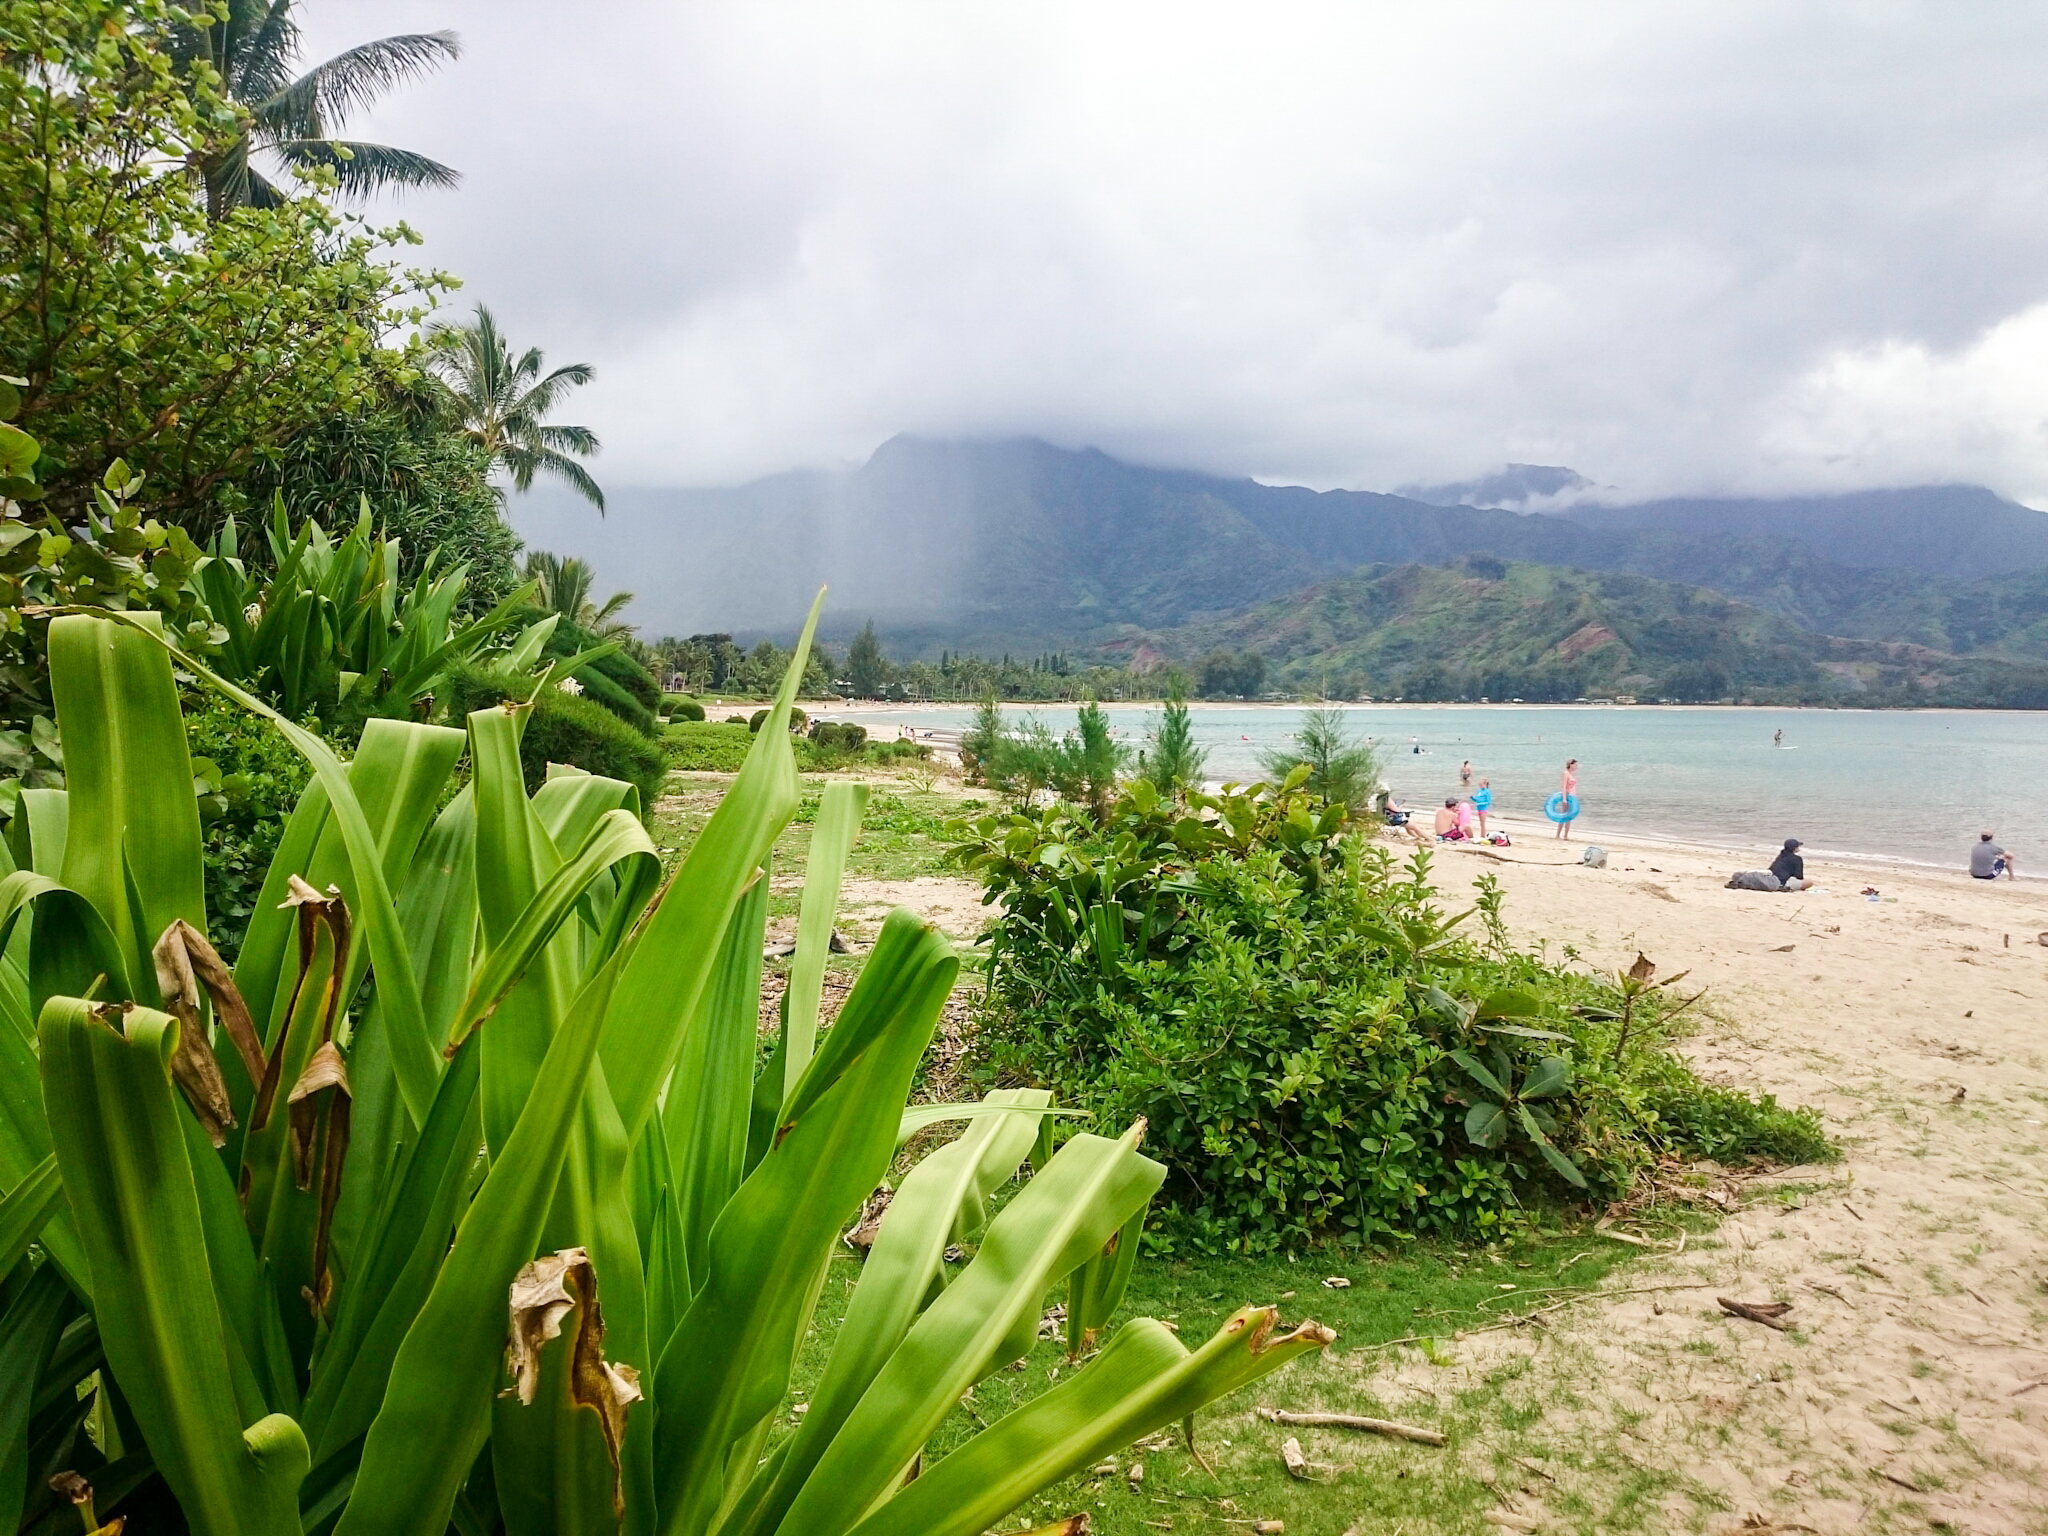 Hanalei beach in Kauai